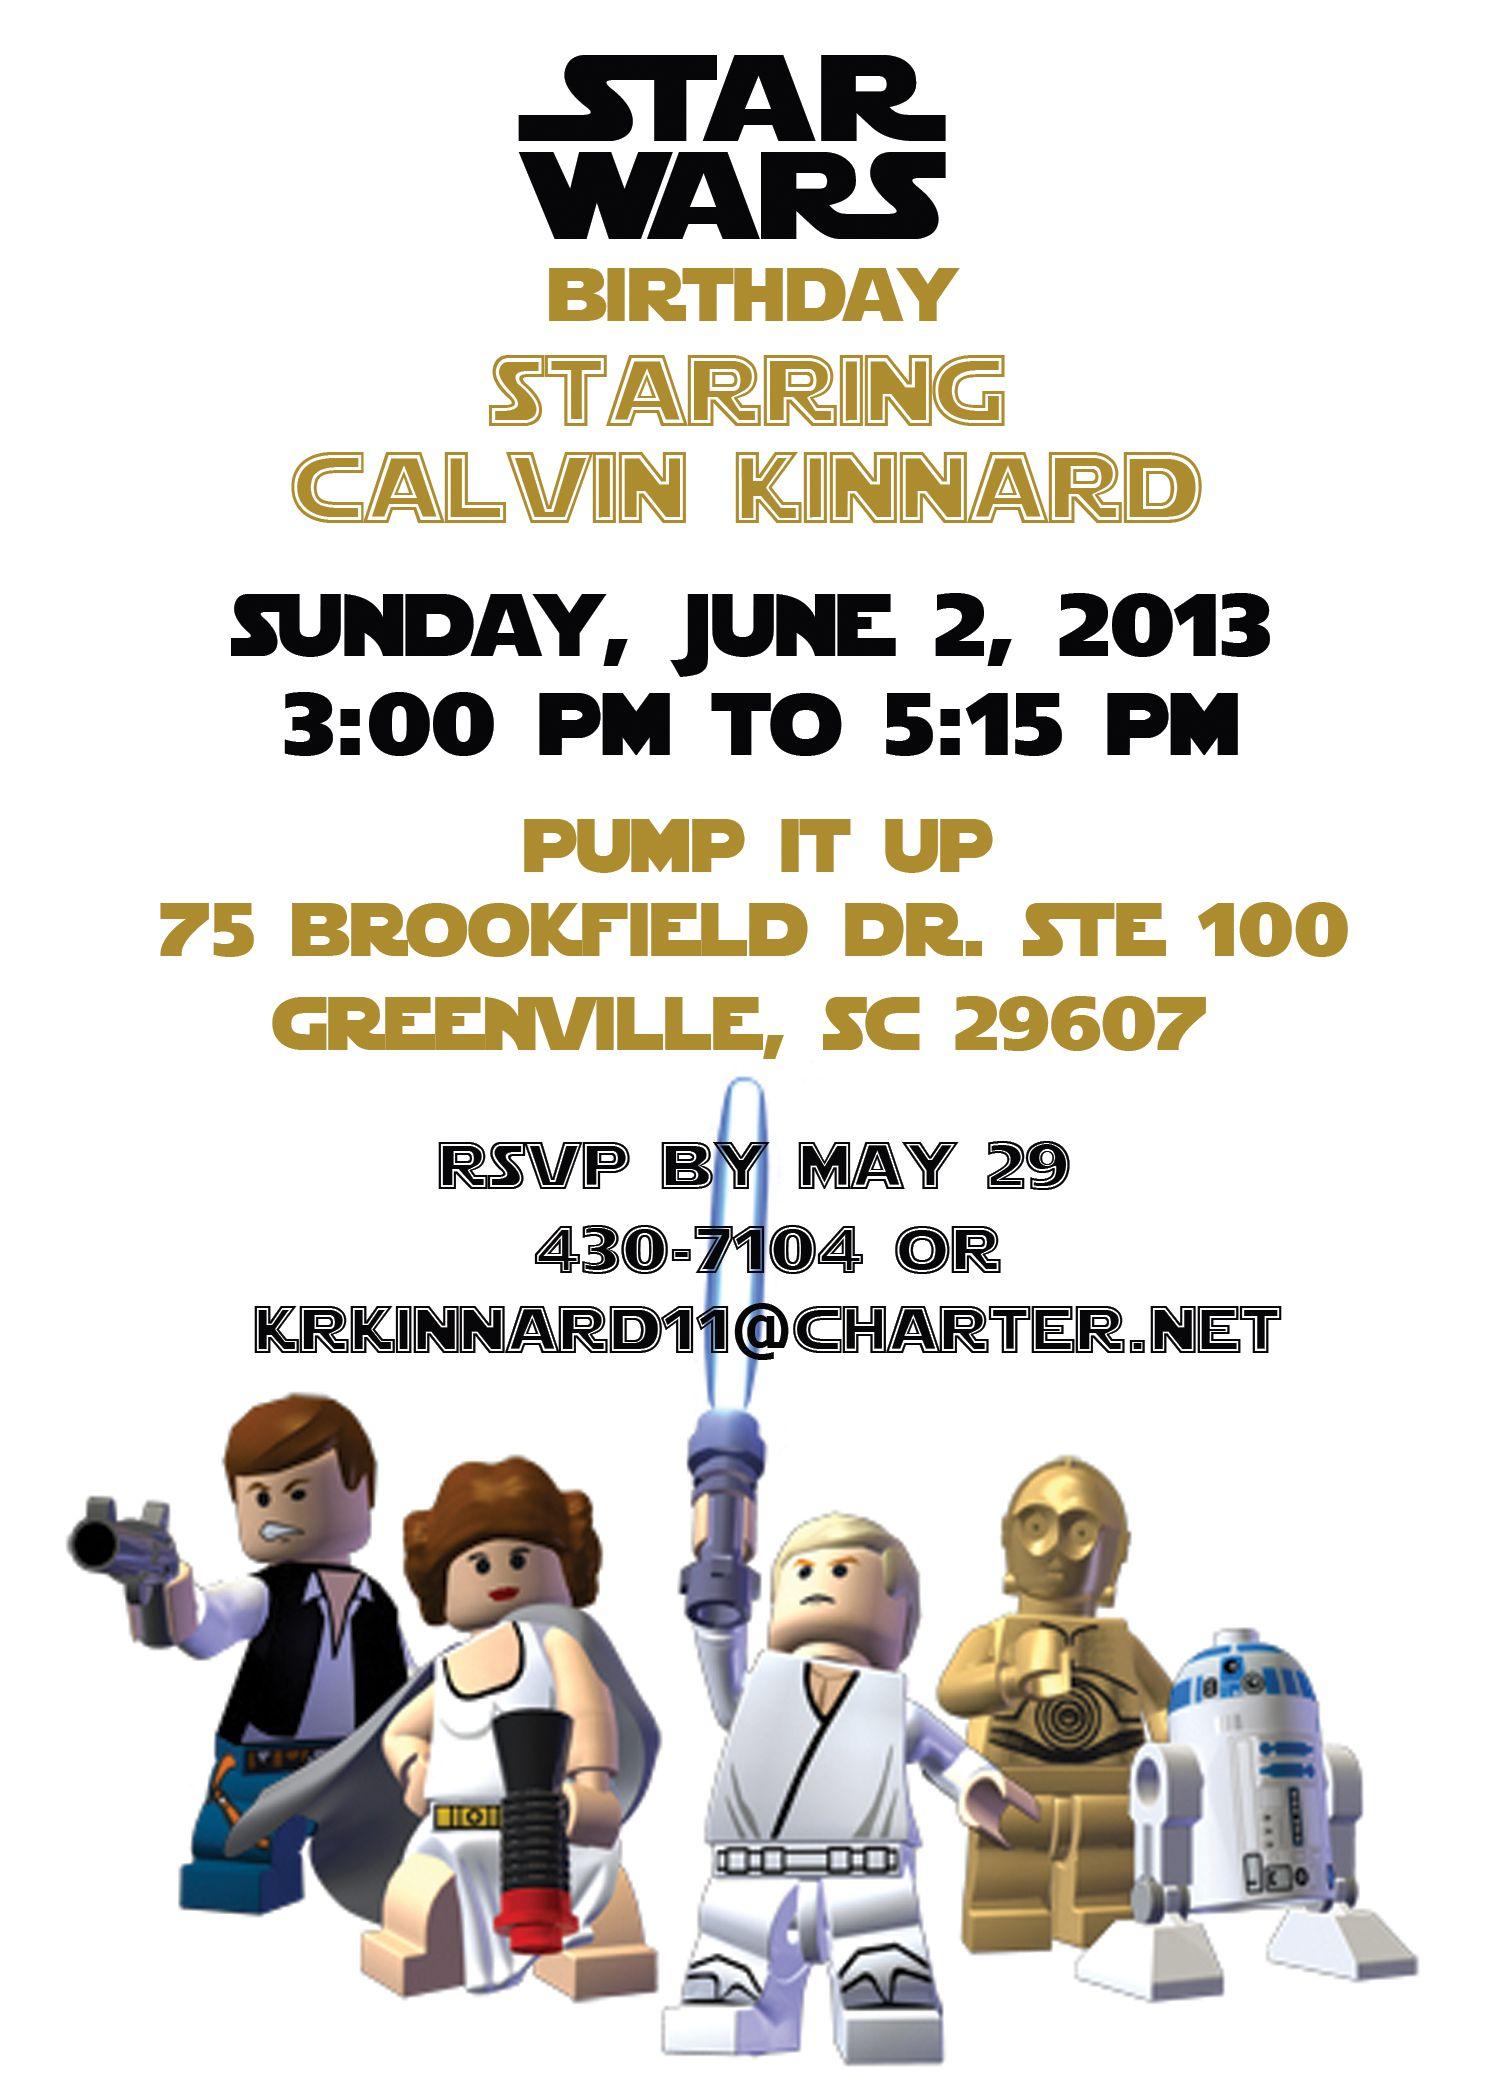 Lego Star Wars birthday party   star wars party   Pinterest   Star ...